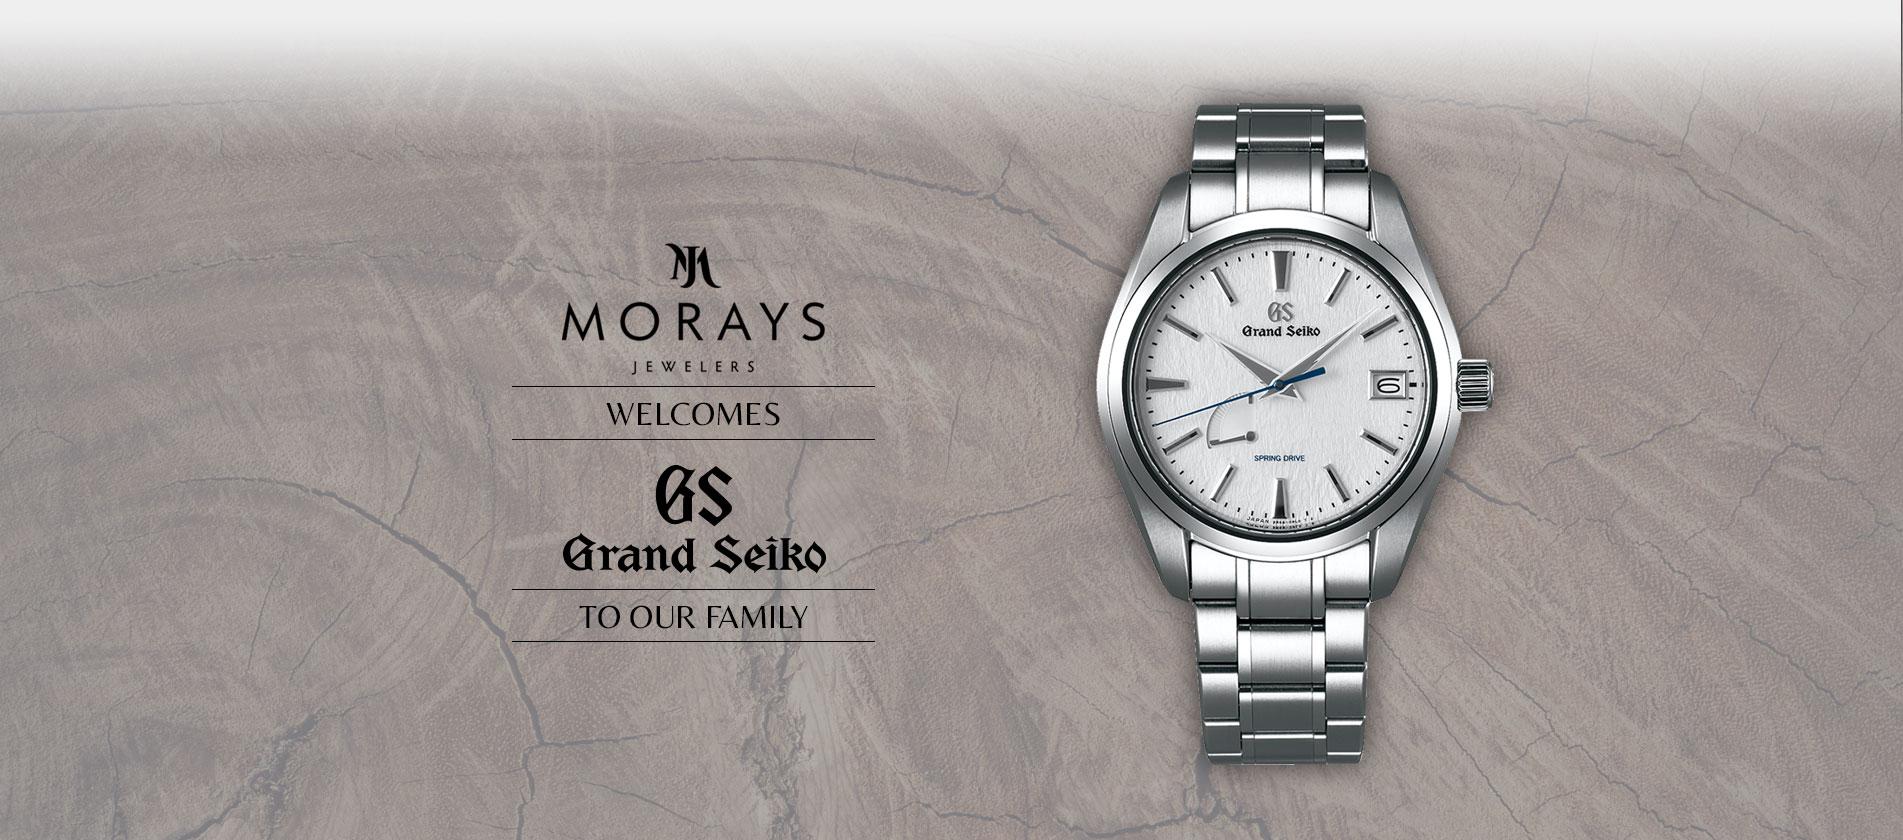 Morays welcomes Grand Seiko to the family